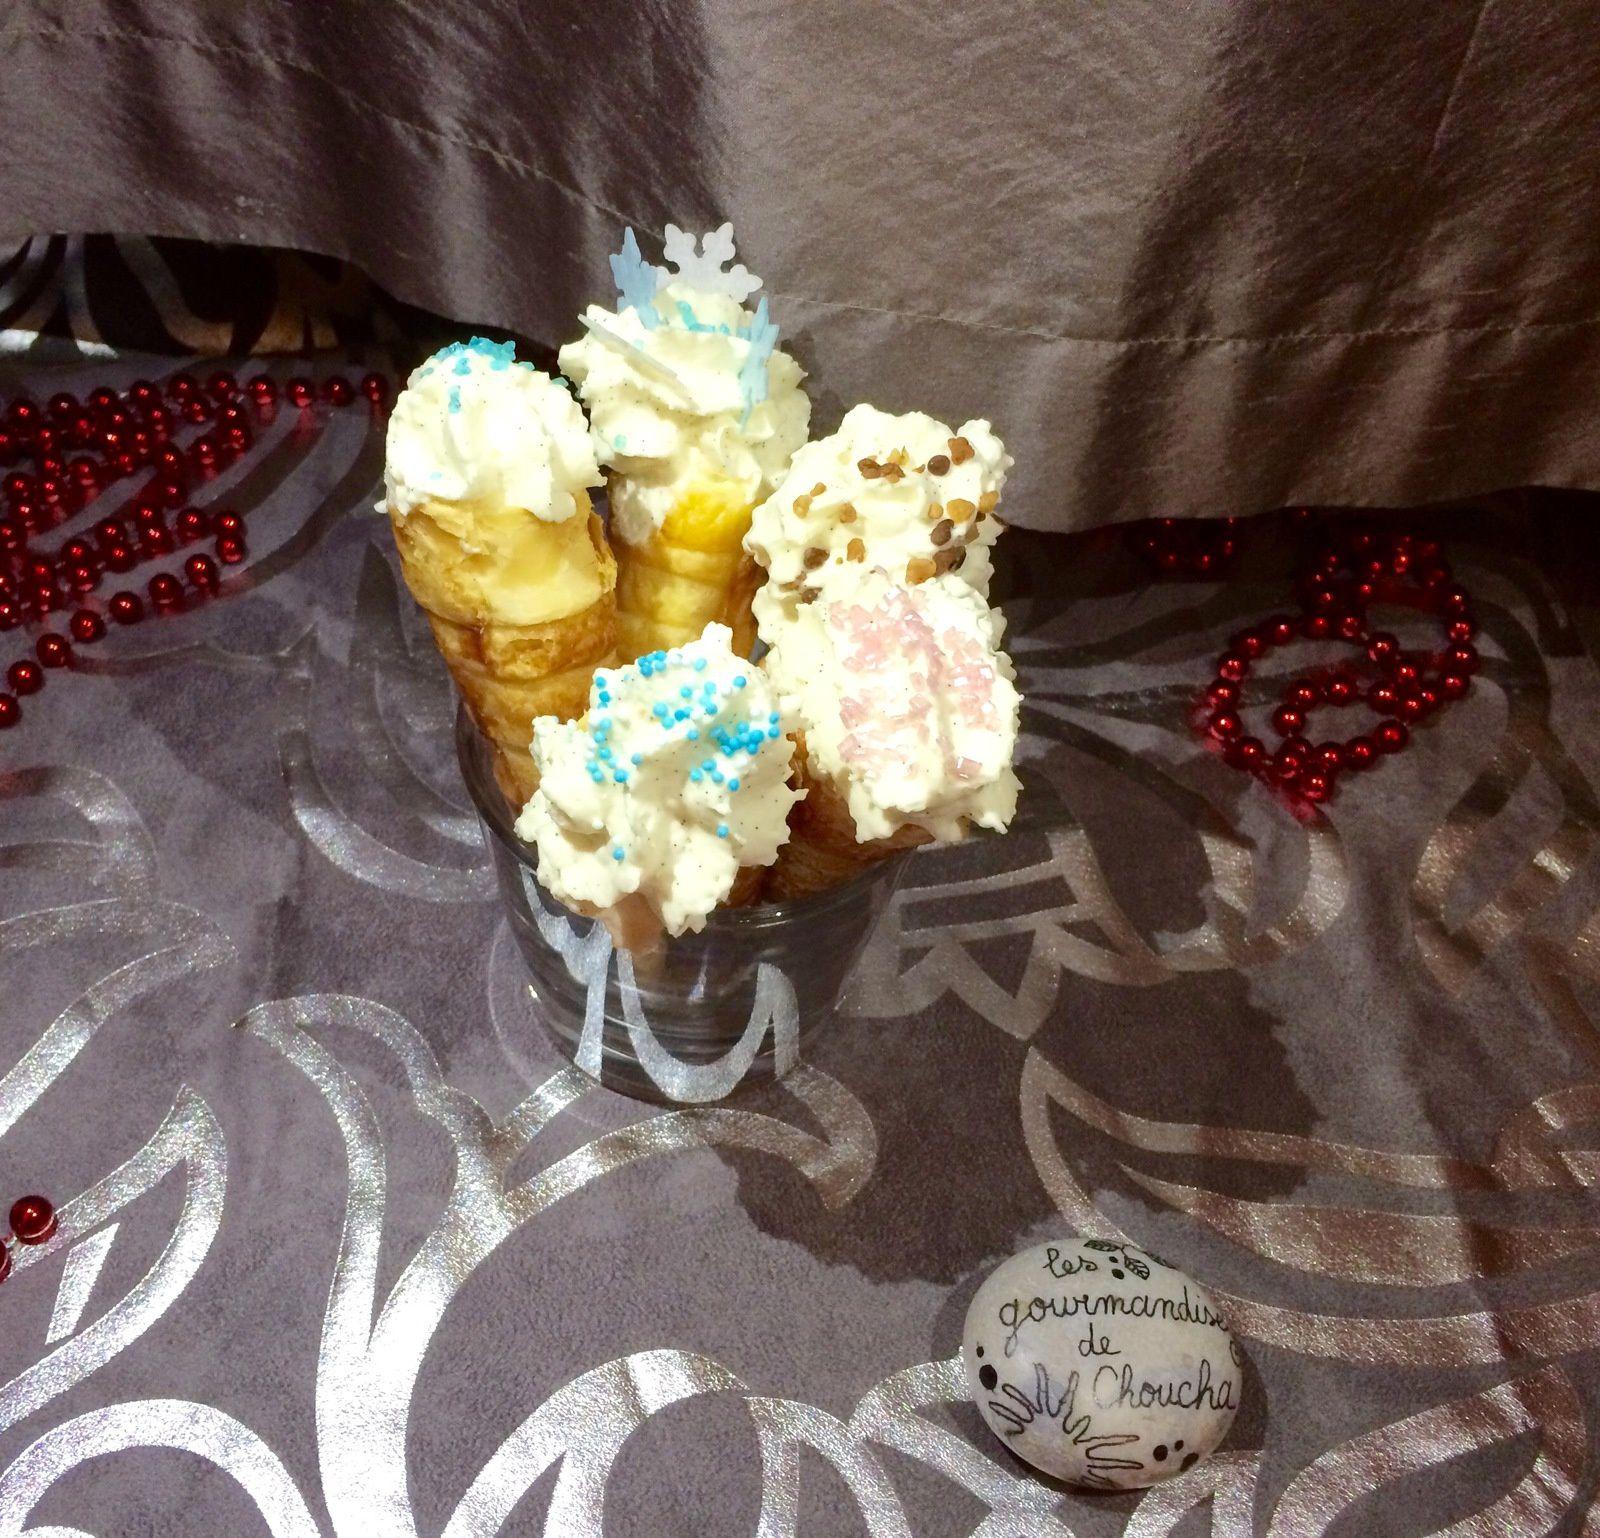 Cônes sucrés : chantilly vanille chocolat blanc ( Michalak)